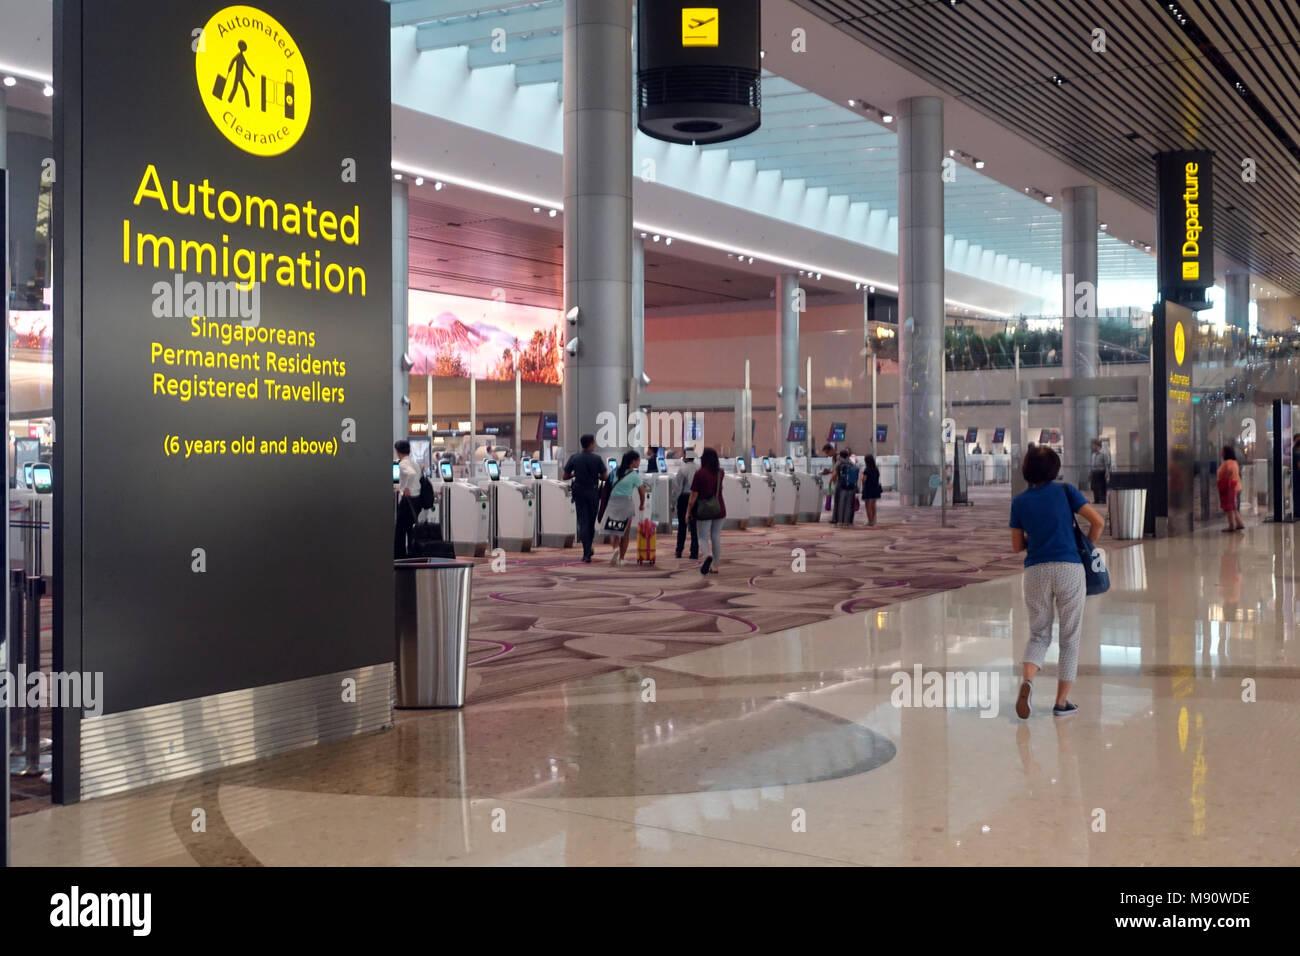 Changi airport. Automated immigration.  Singapore. - Stock Image